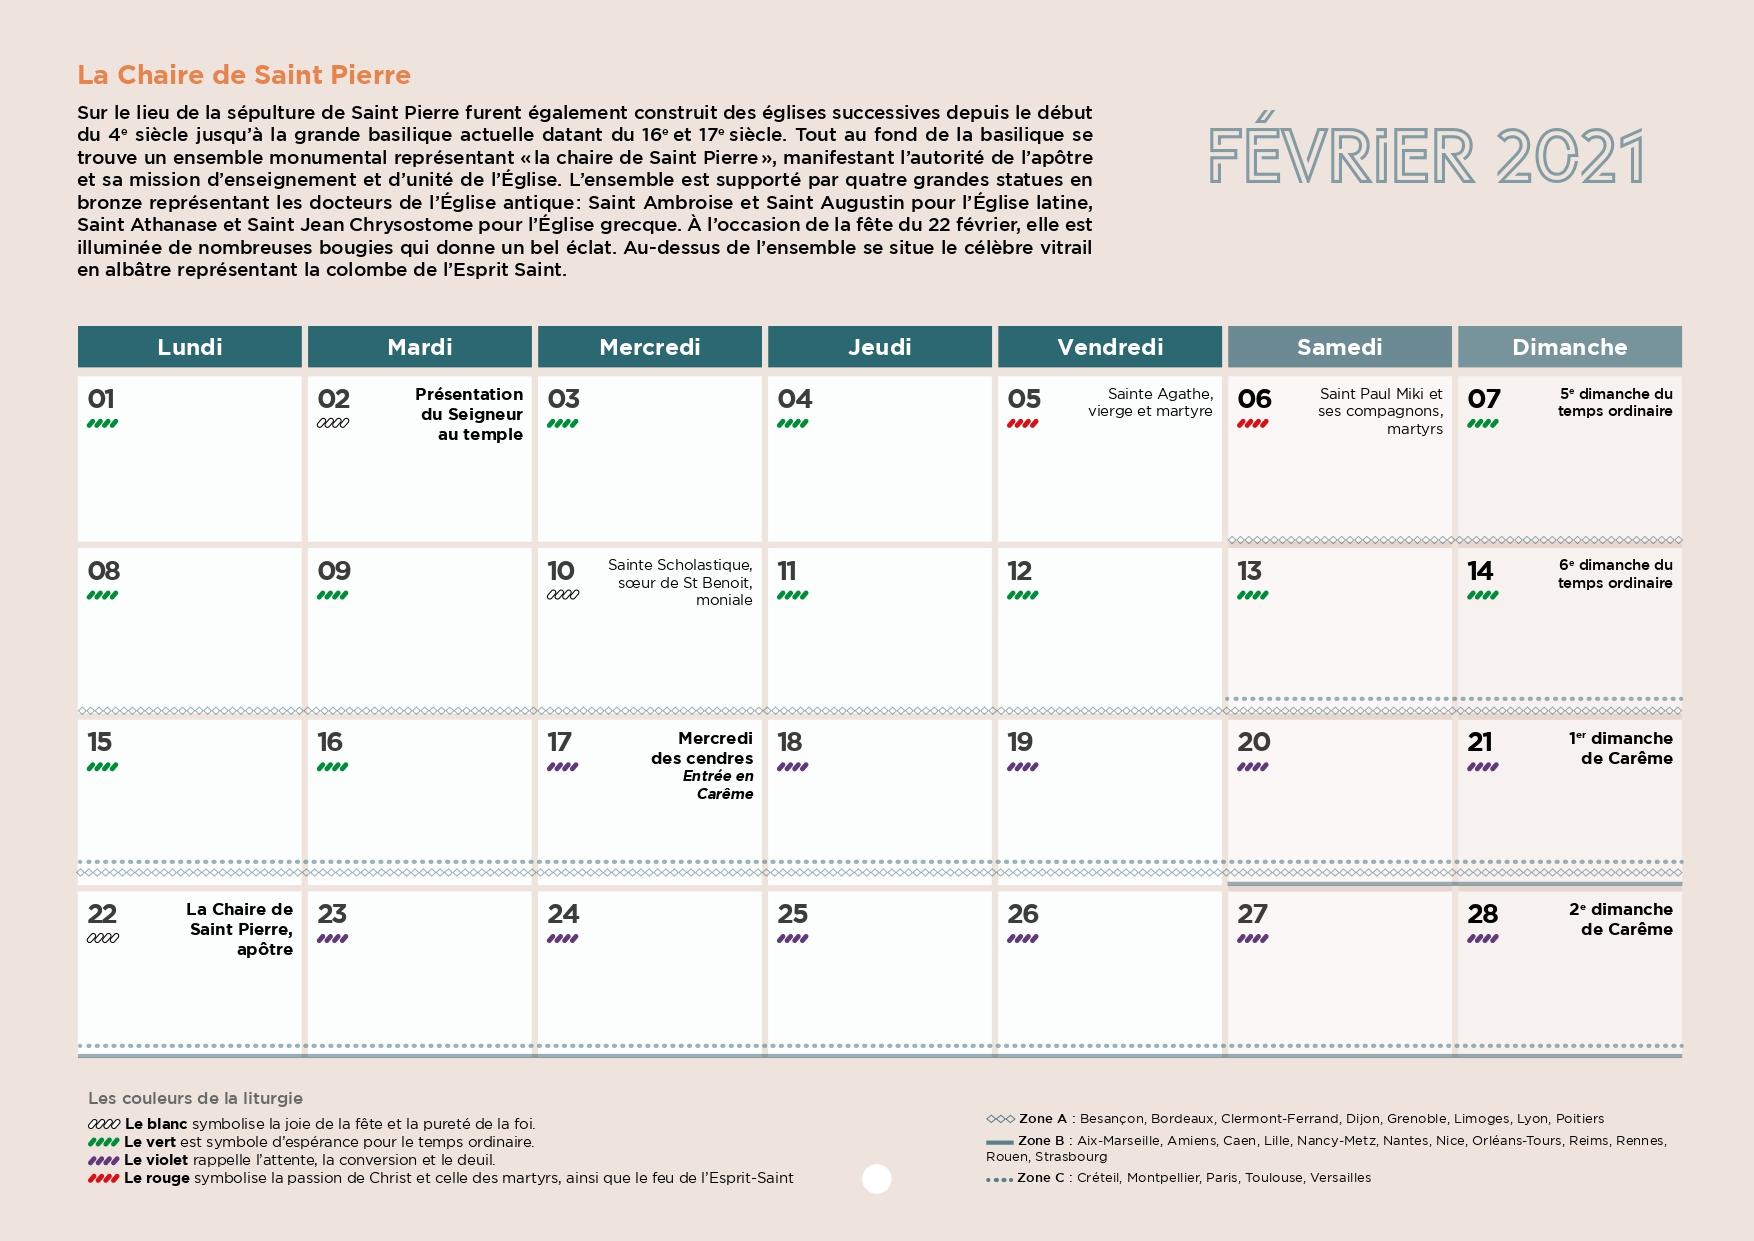 Calendrier Servants-2021-web- p 1-9 (002)_page-0007